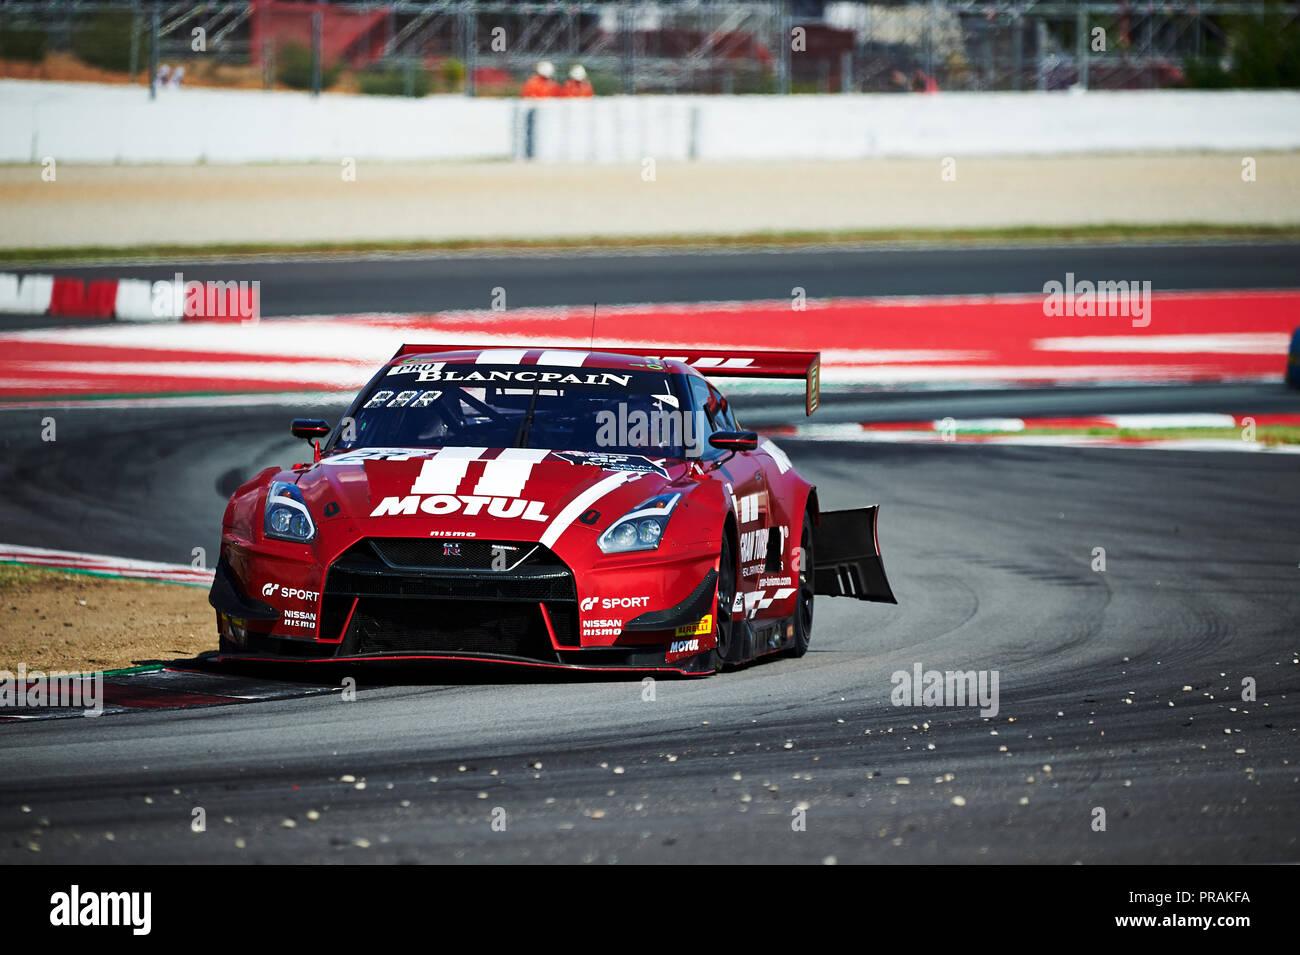 Nissan Gtr Nismo Gt3 Stock Photos Nissan Gtr Nismo Gt3 Stock